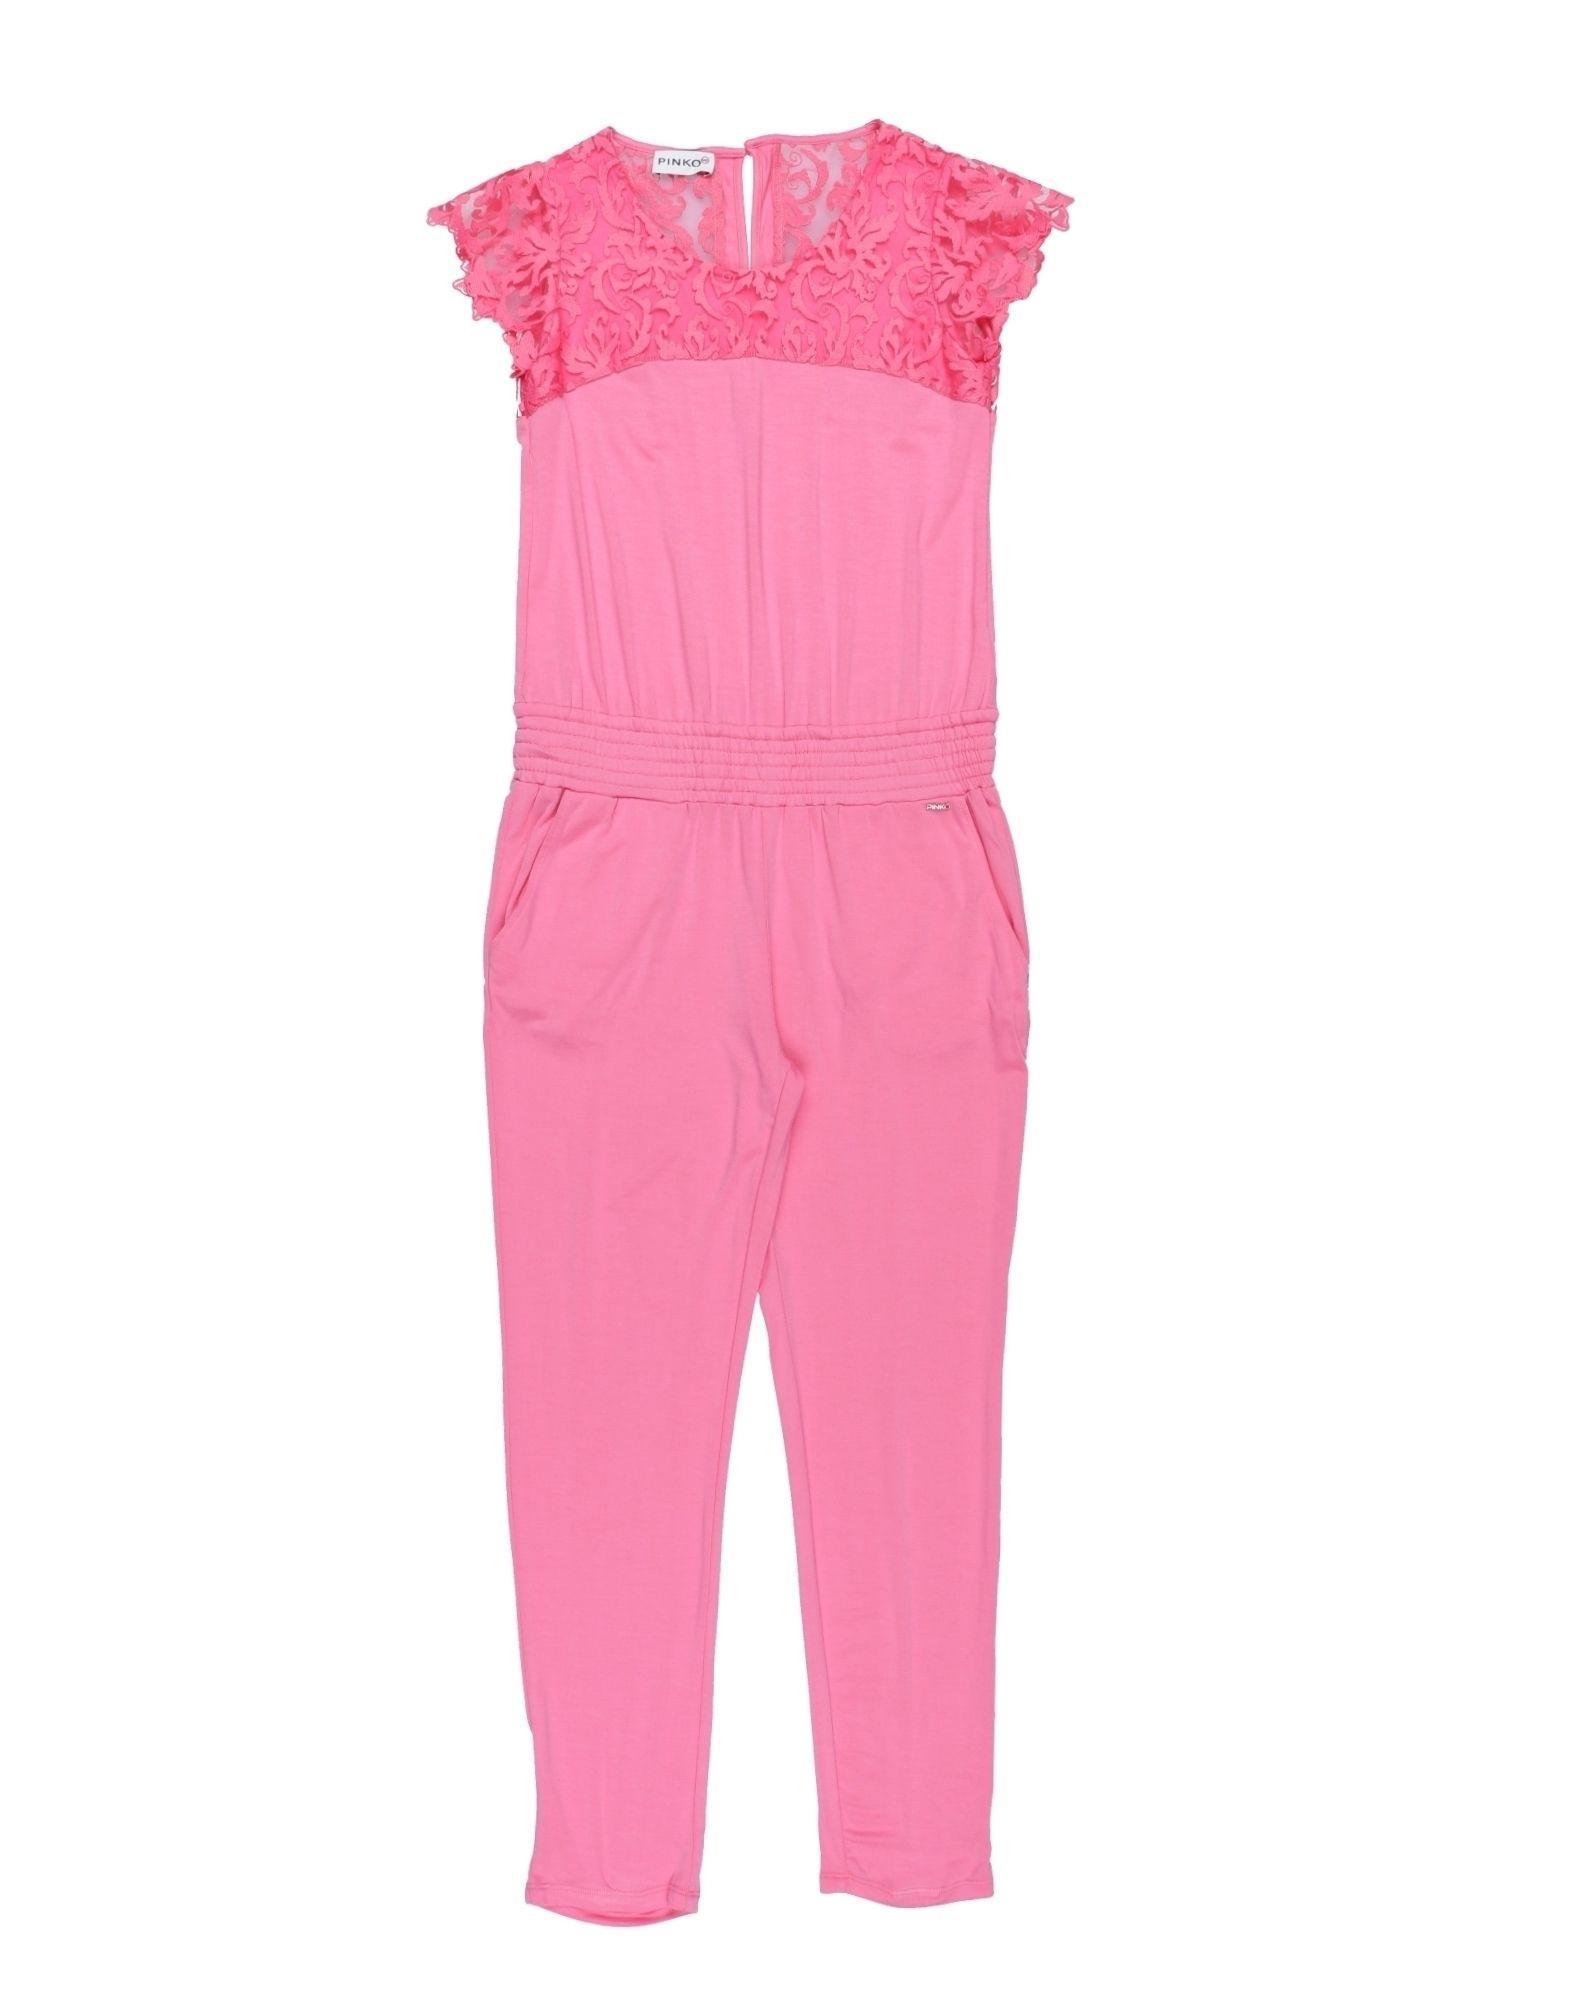 PINKO UP パンツジャンプスーツ ピンク